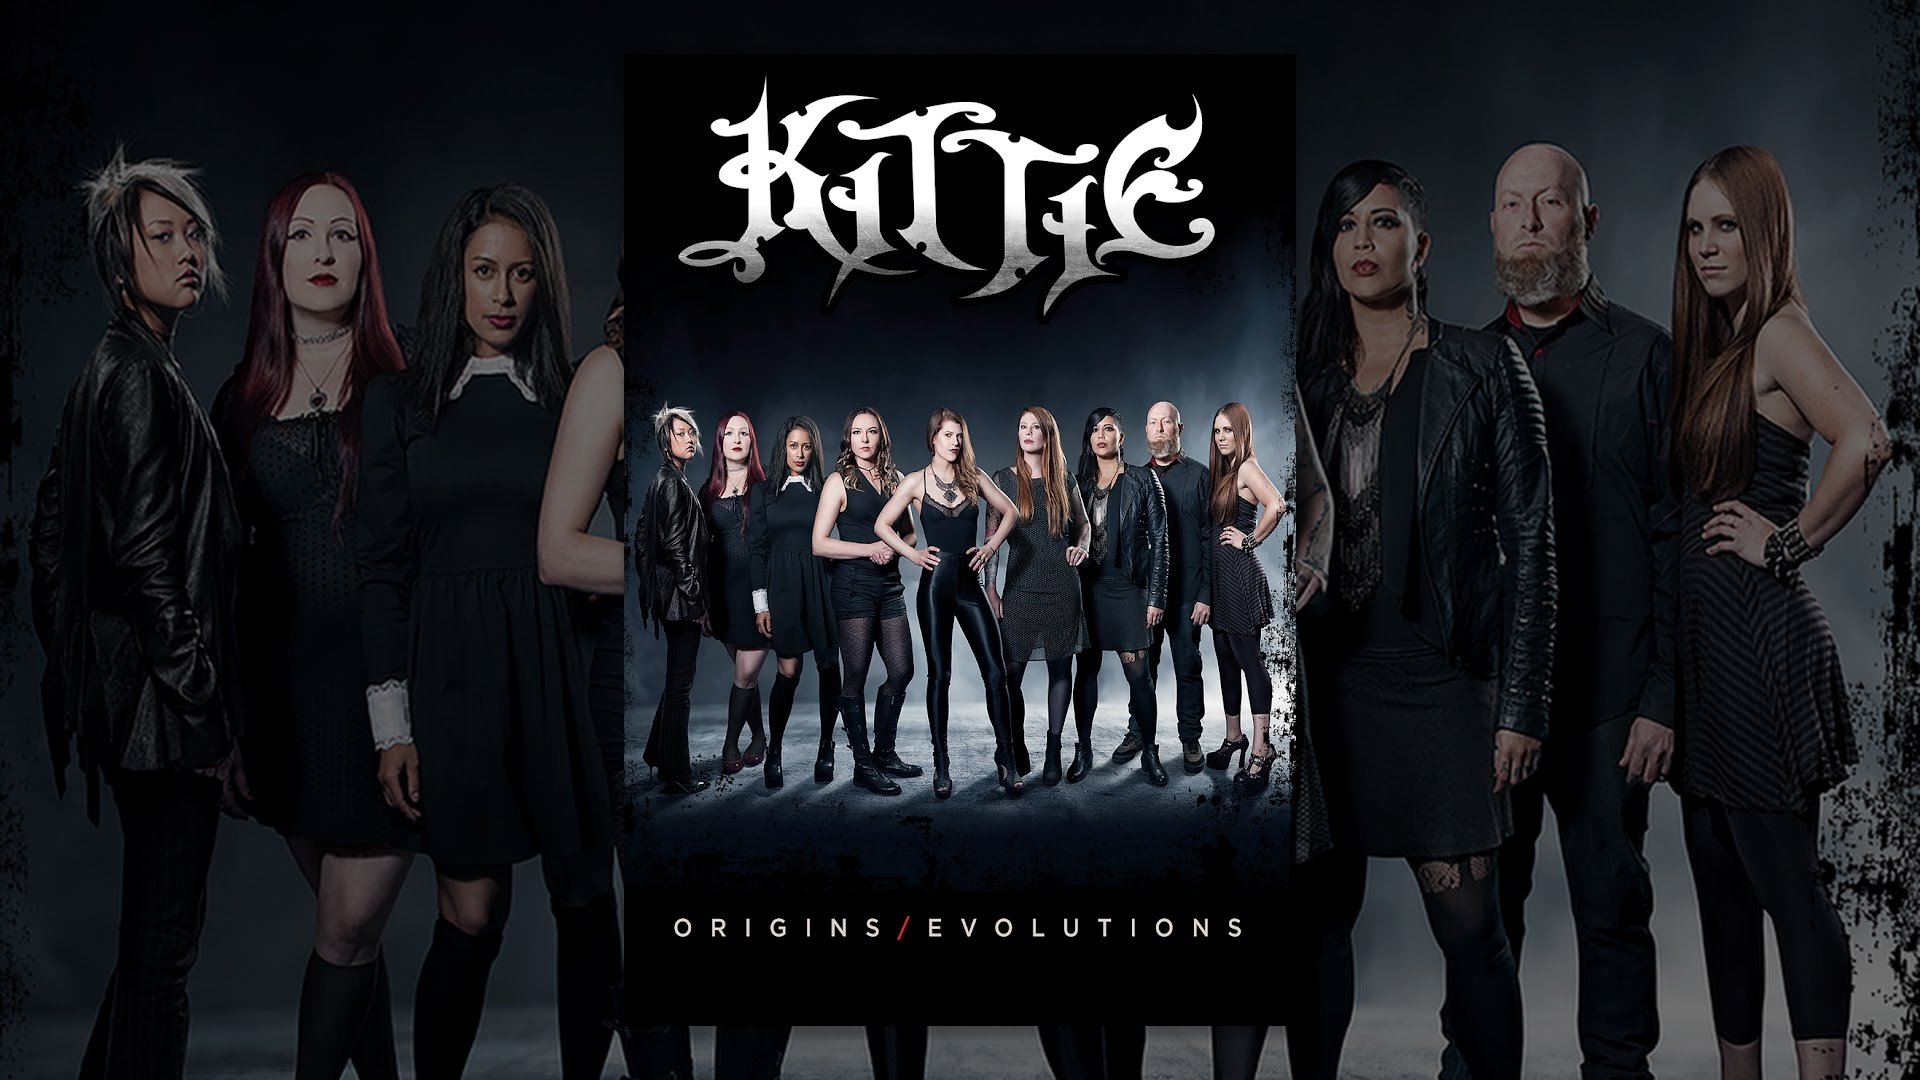 [VIDEO] - Kittie: Origins/Evolutions 2